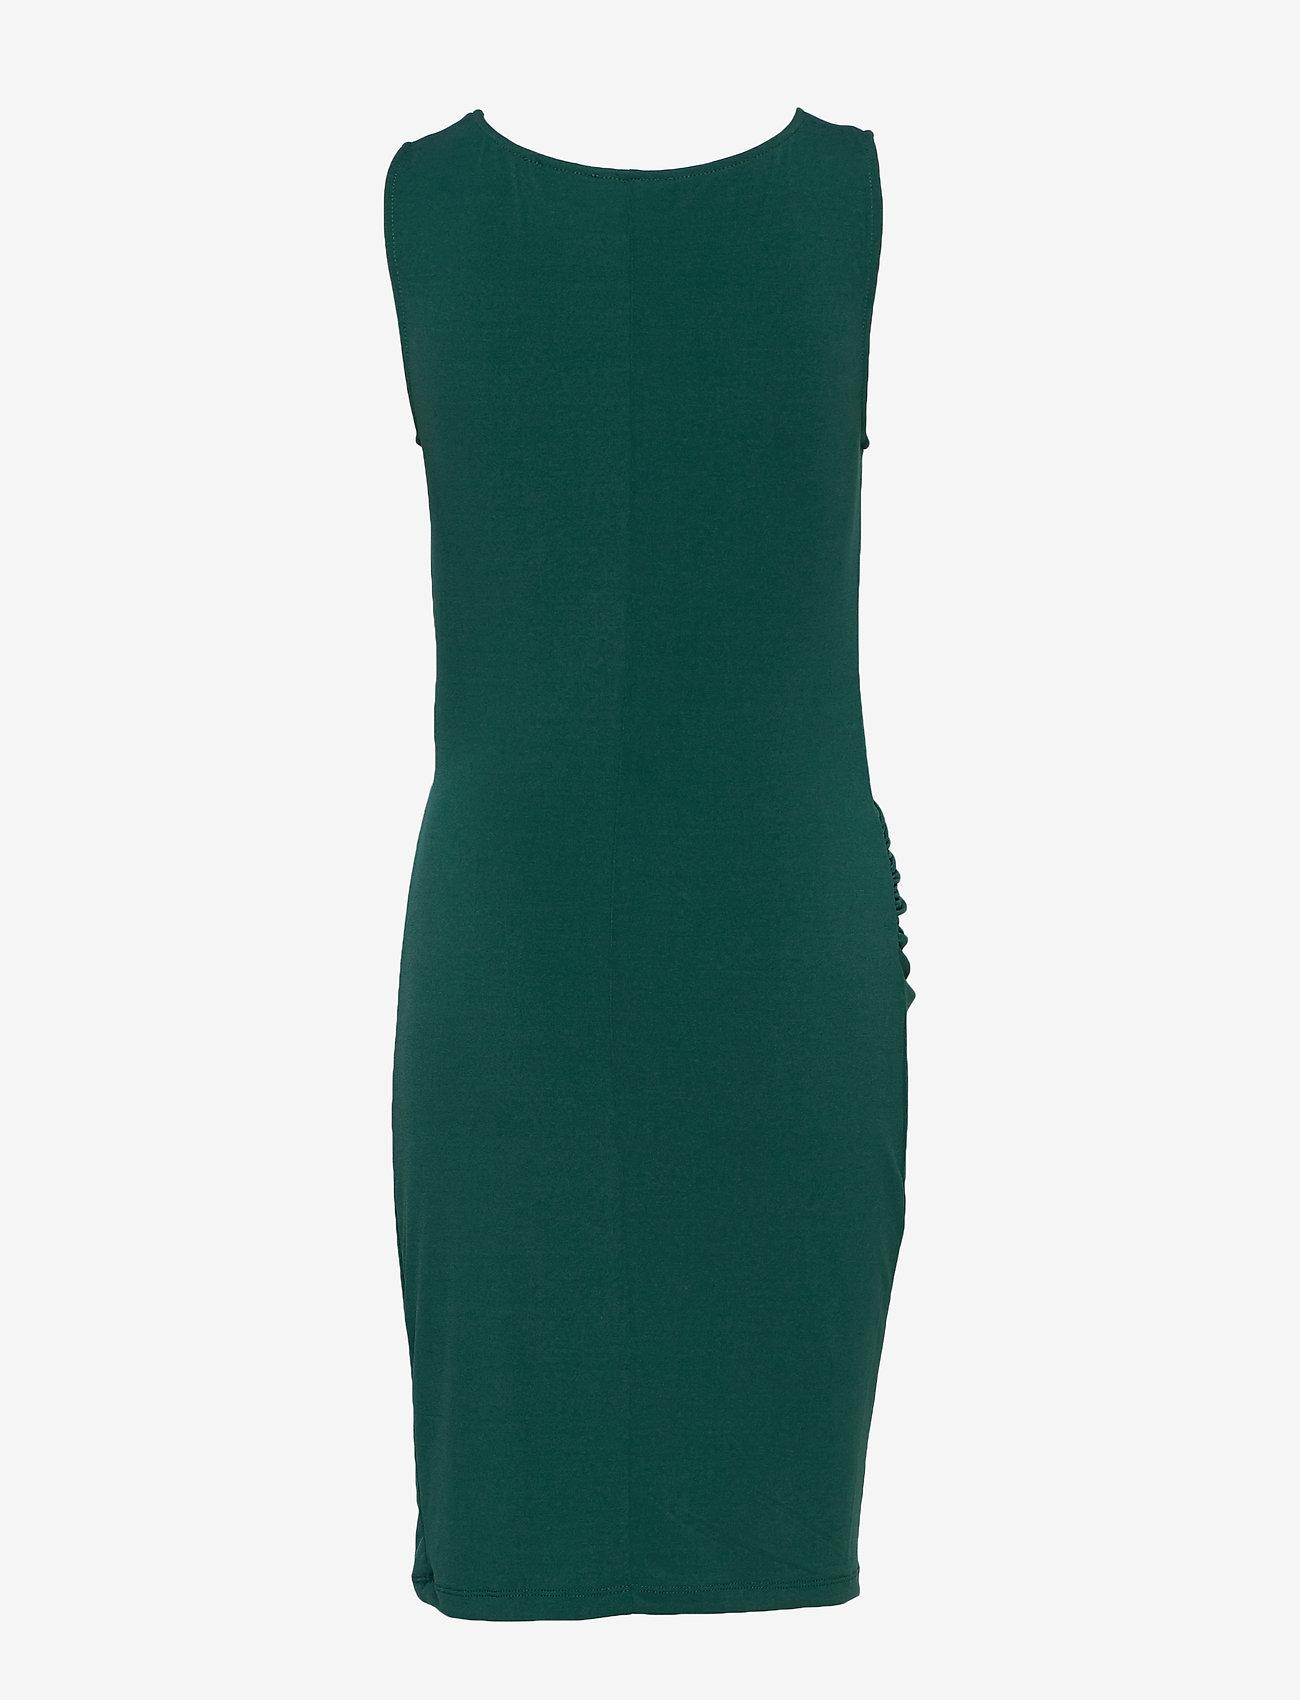 Selected Femme - SLFTANJA-TELLER SL DRESS EX - robes midi - ponderosa pine - 1